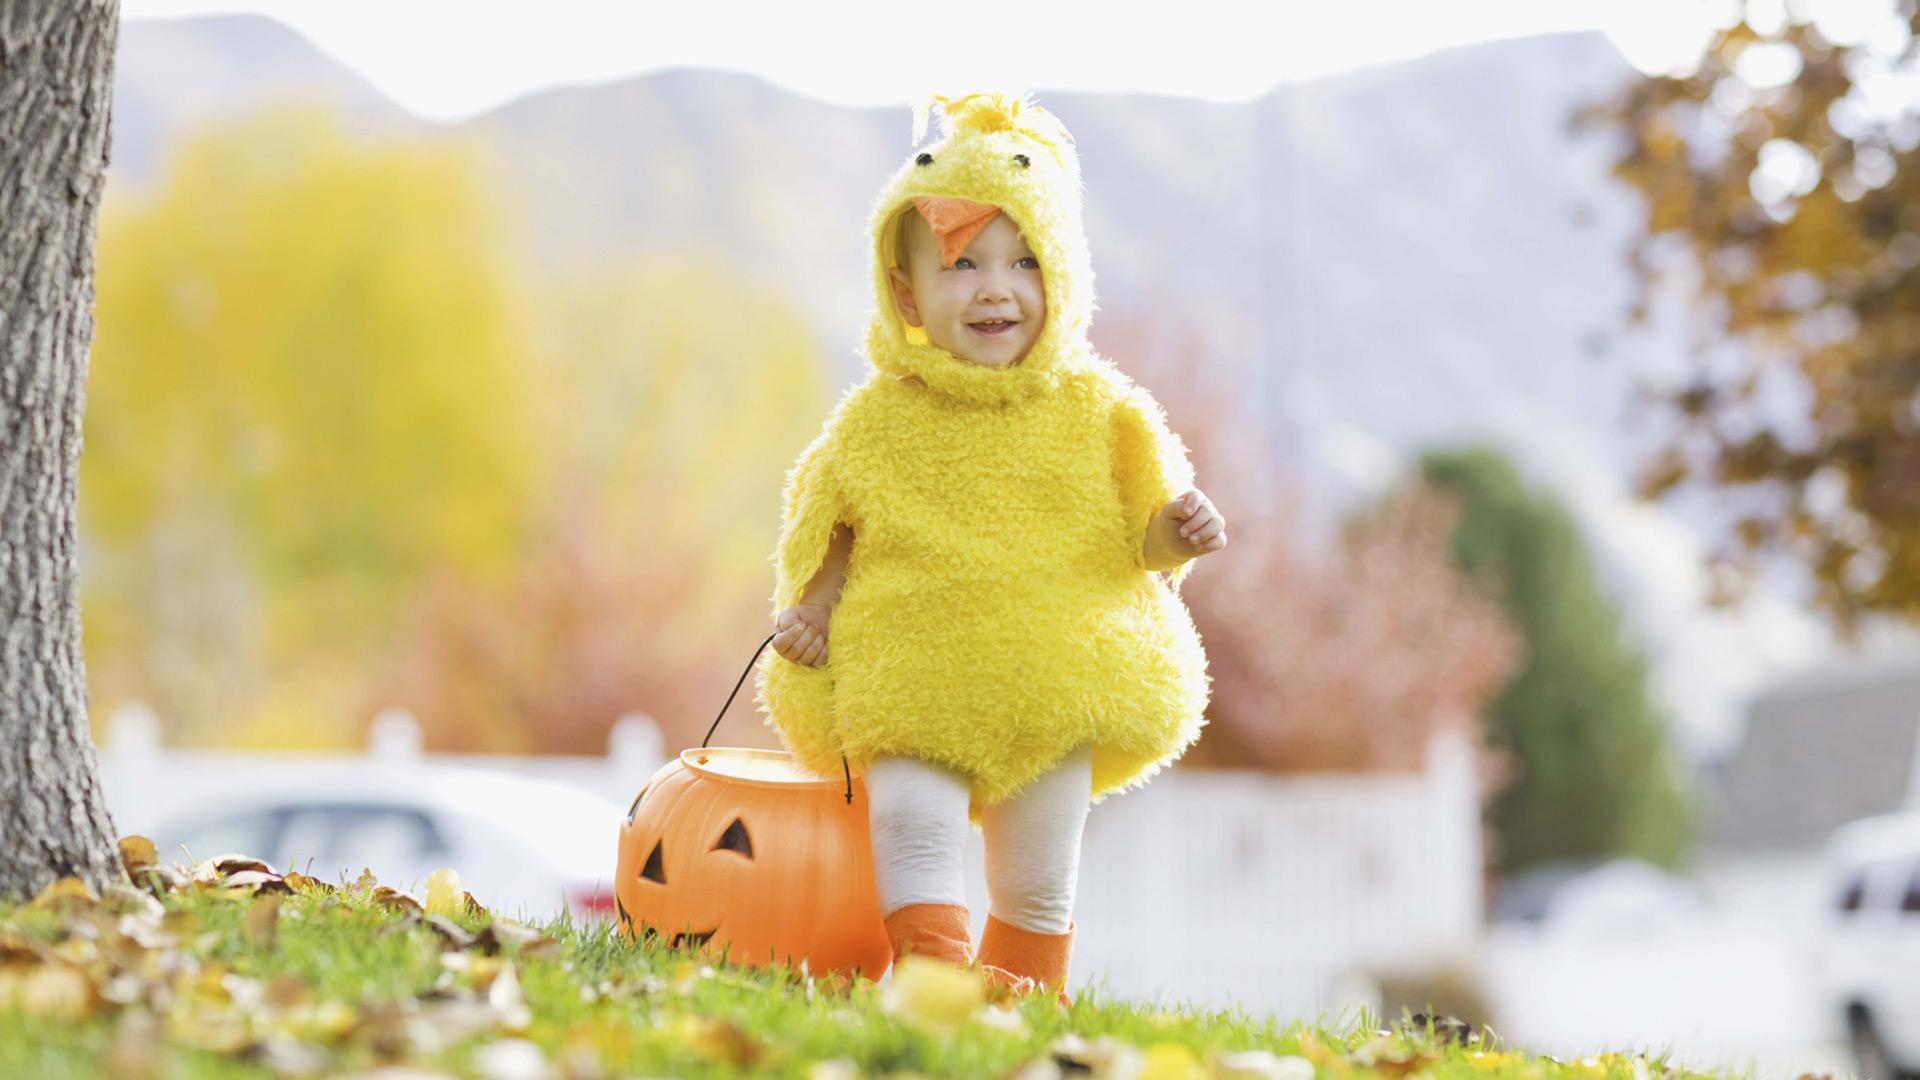 Toddler in halloween costume | PregnancyAndBaby.com